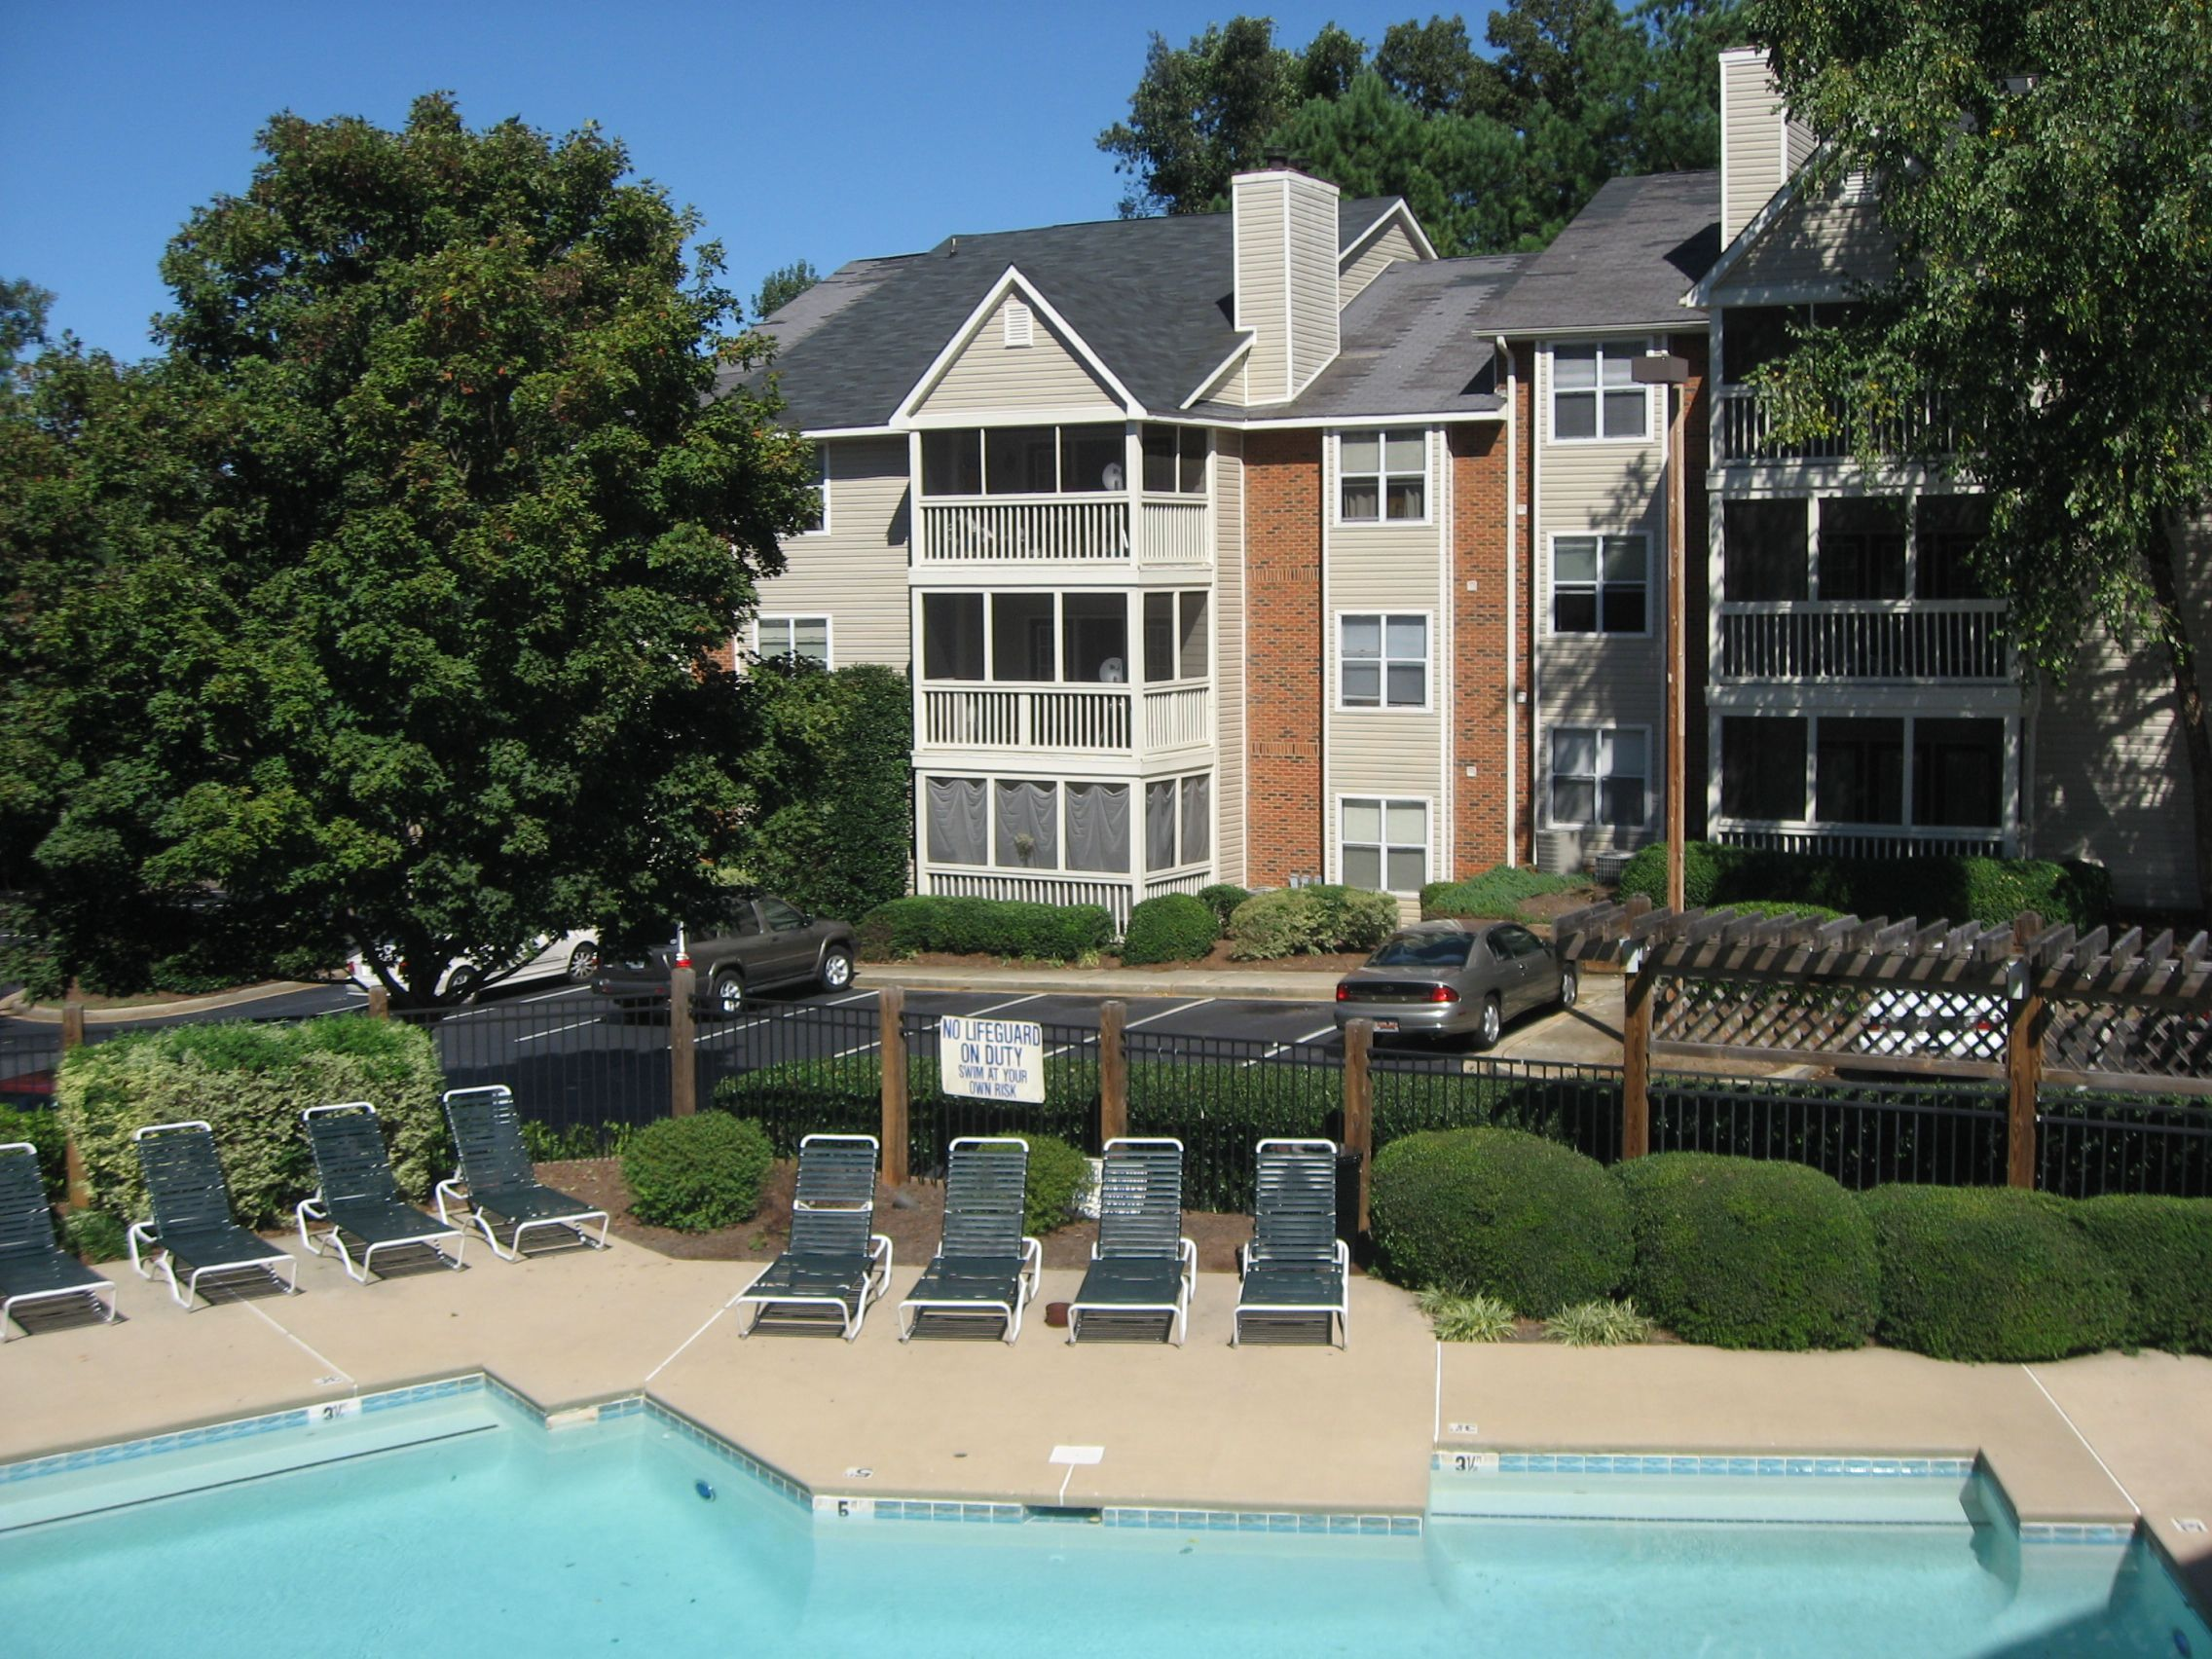 47 Cottonwood Communities Ideas Cottonwood Apartment Finding Apartments